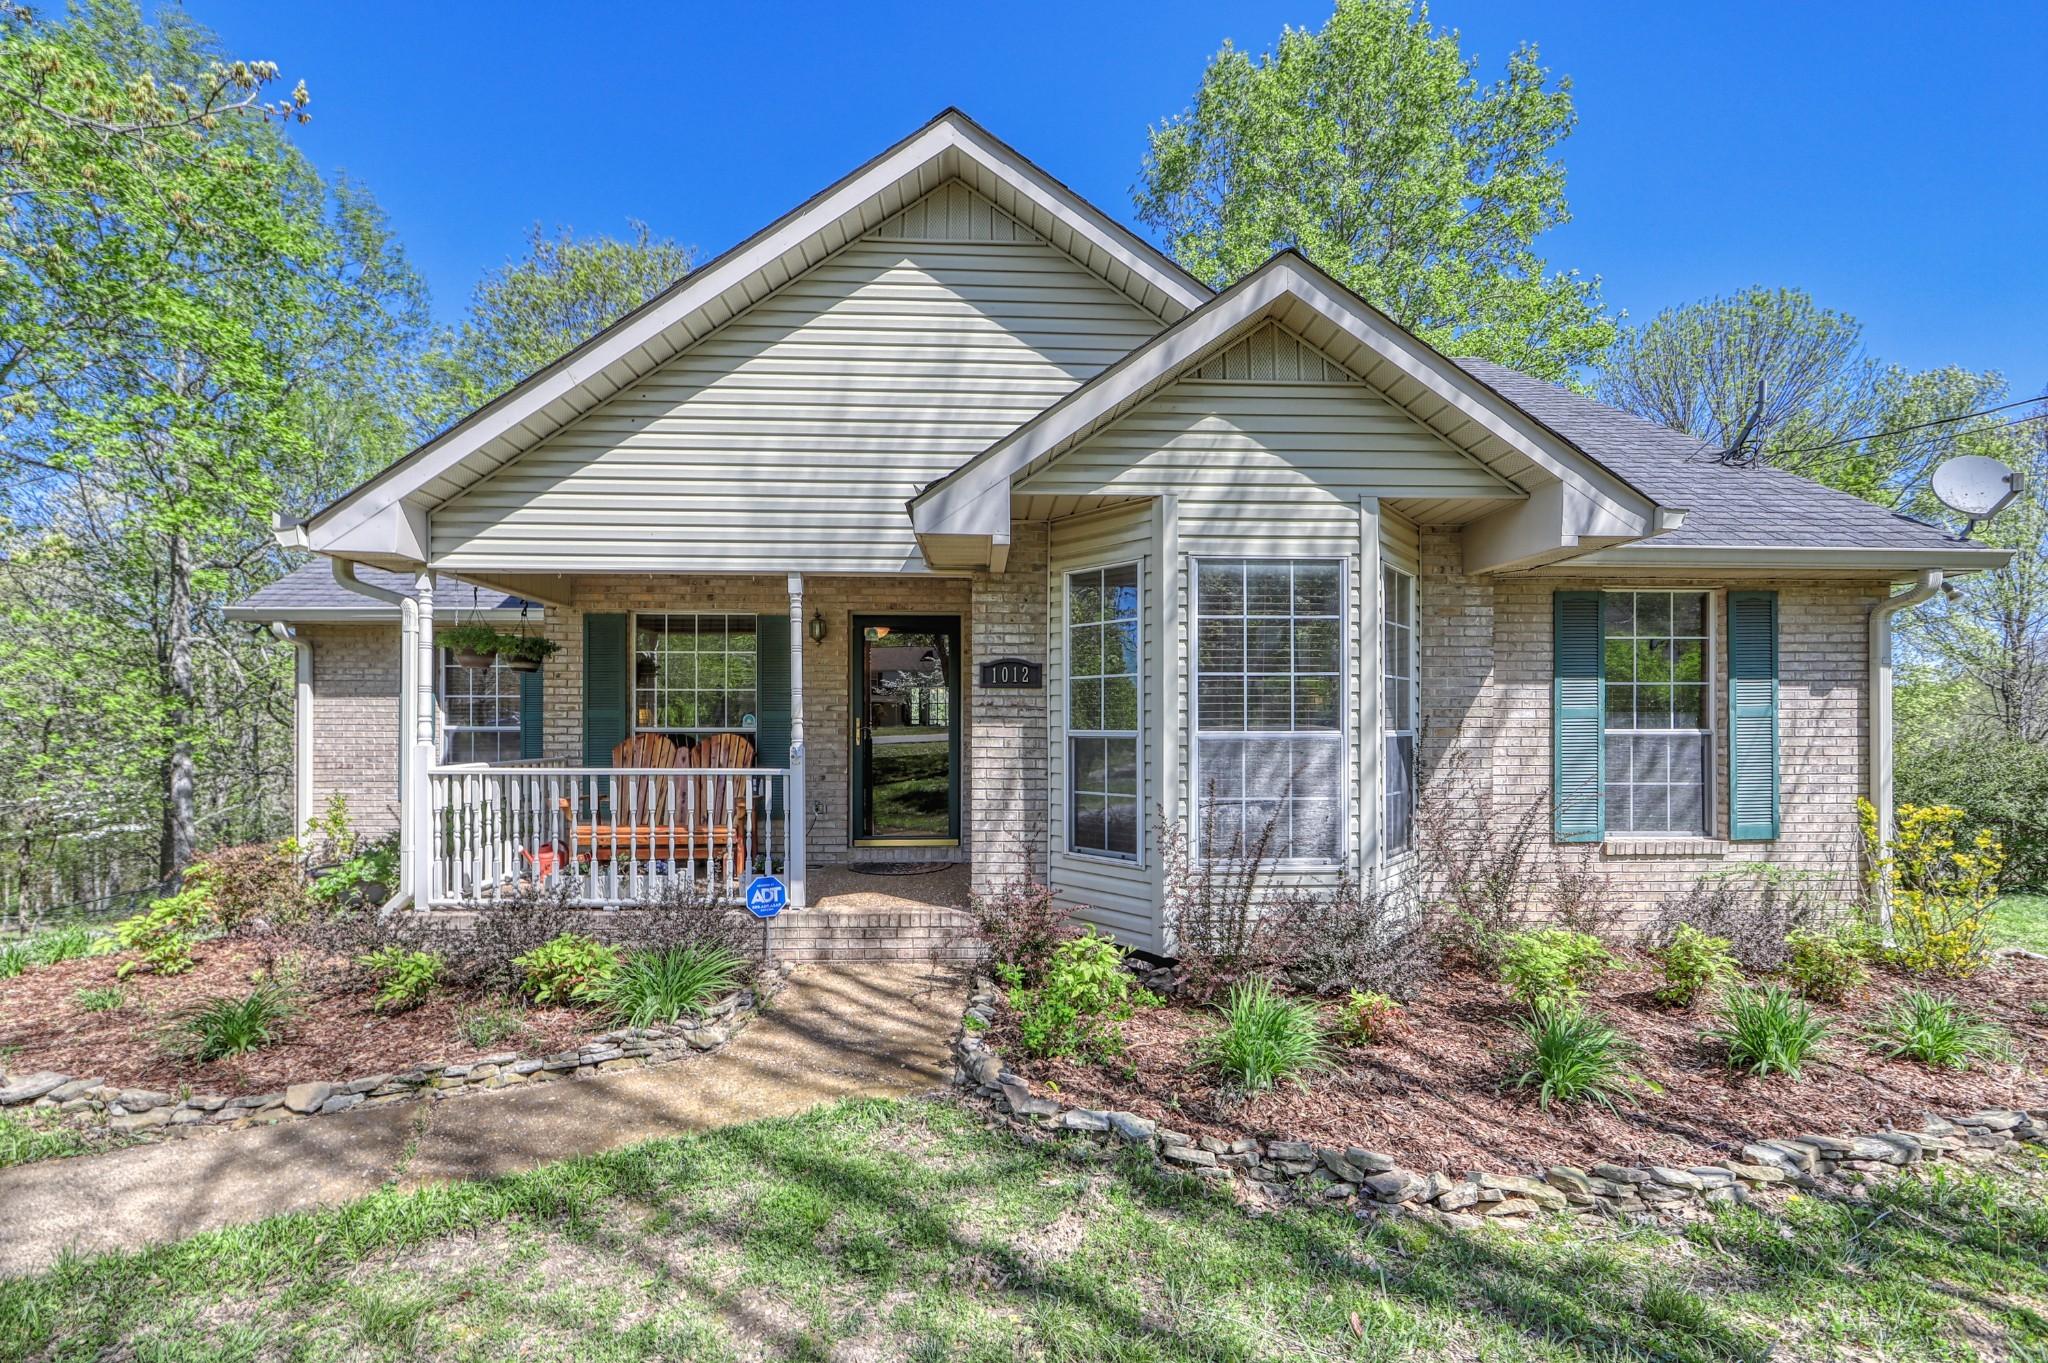 1012 Drewwood Ct, Joelton, TN 37080 - Joelton, TN real estate listing